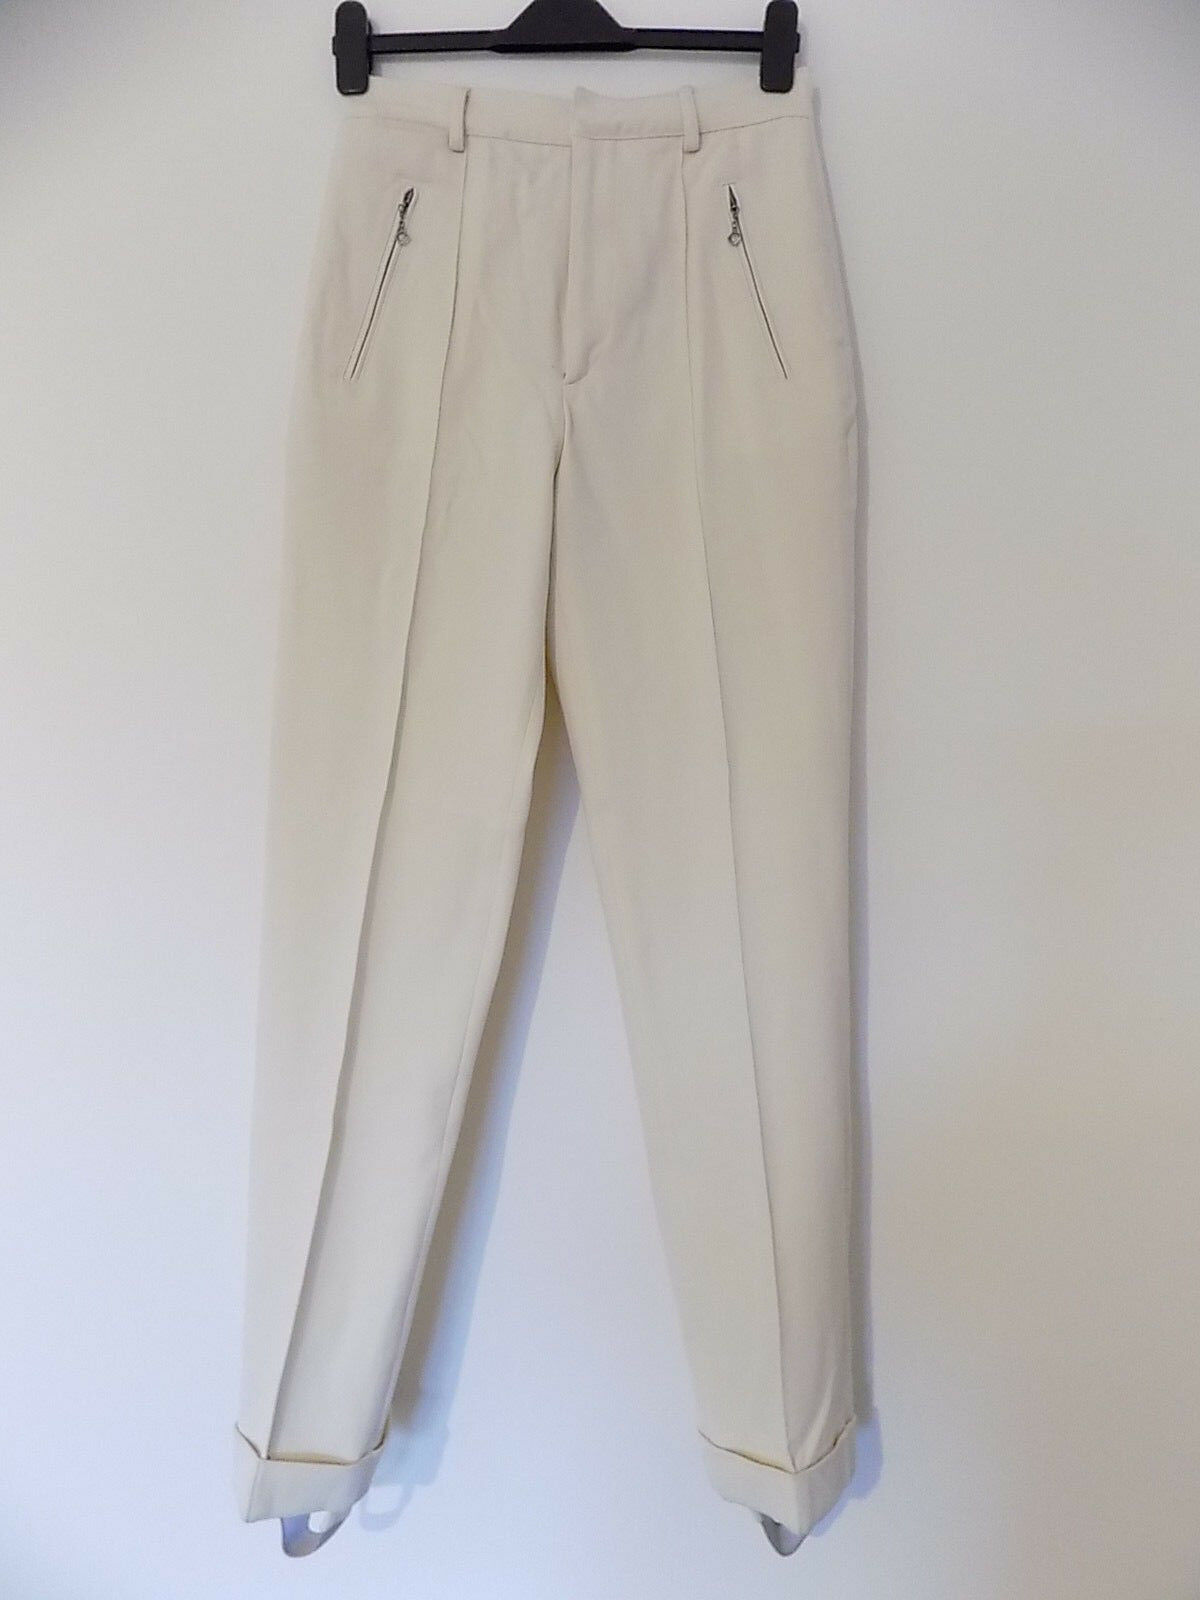 Ralph Lauren sports woman vintage stirrup trousers size 10 immacualte condit mi